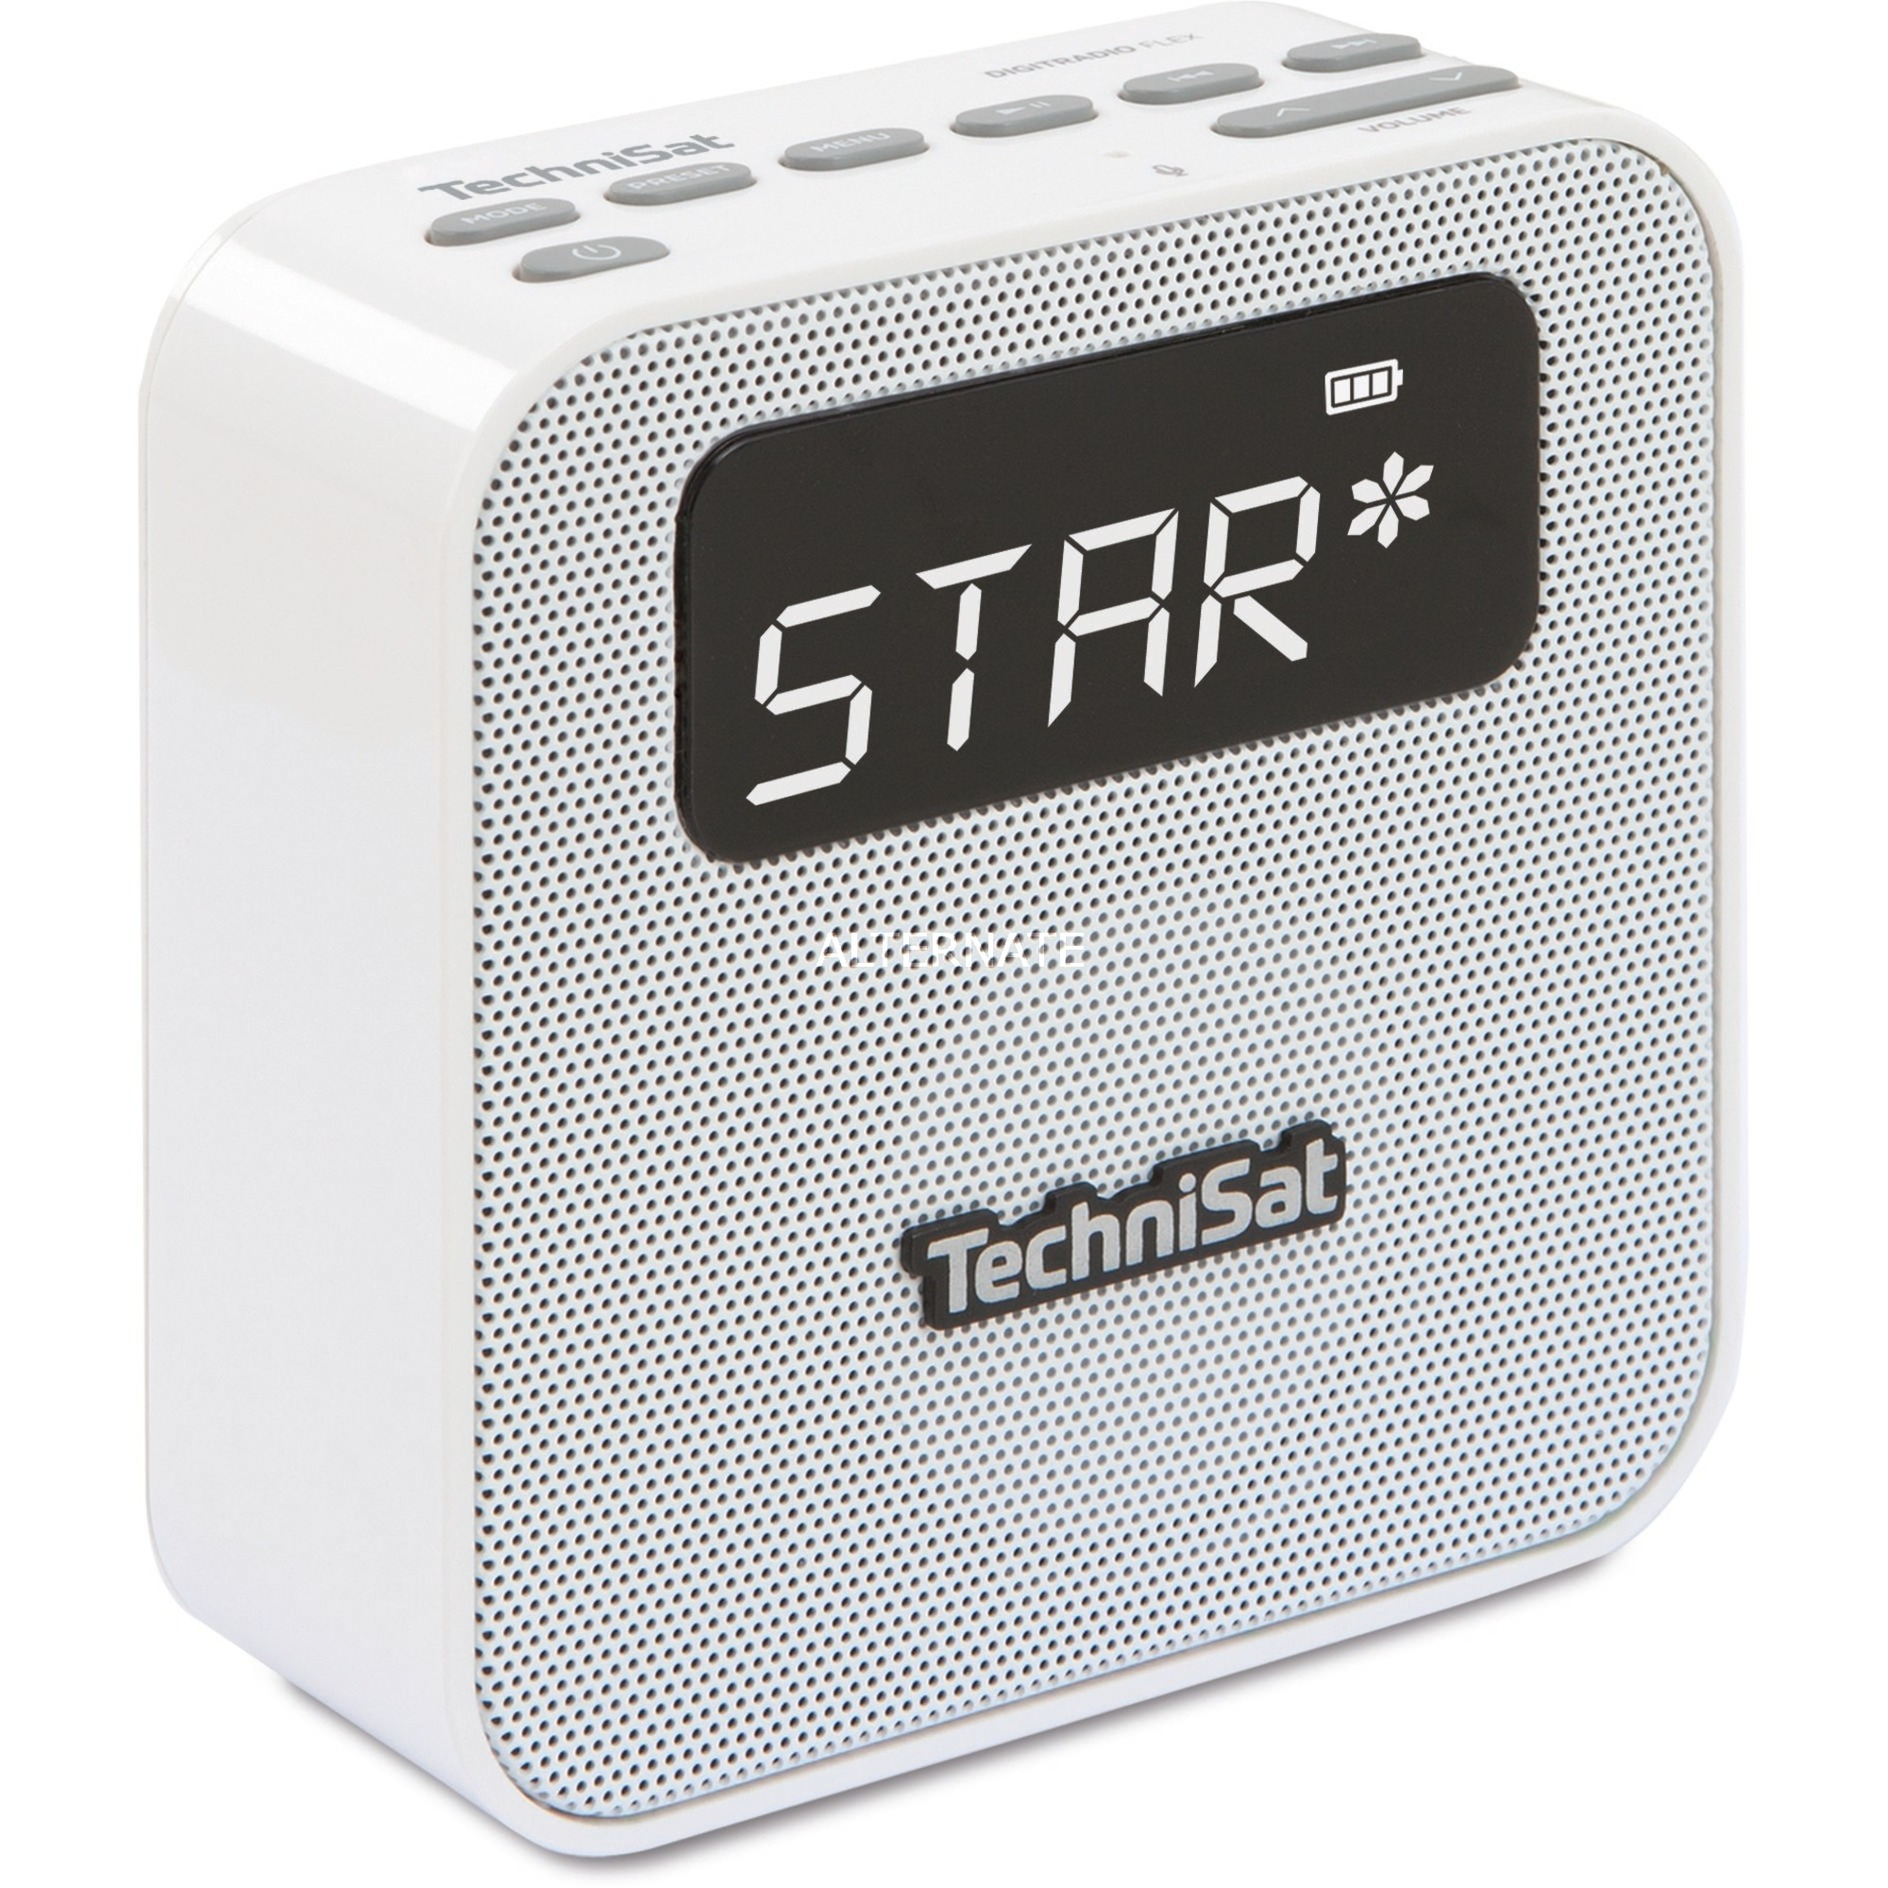 0001/4994 Portátil Analógico y digital Plata radio